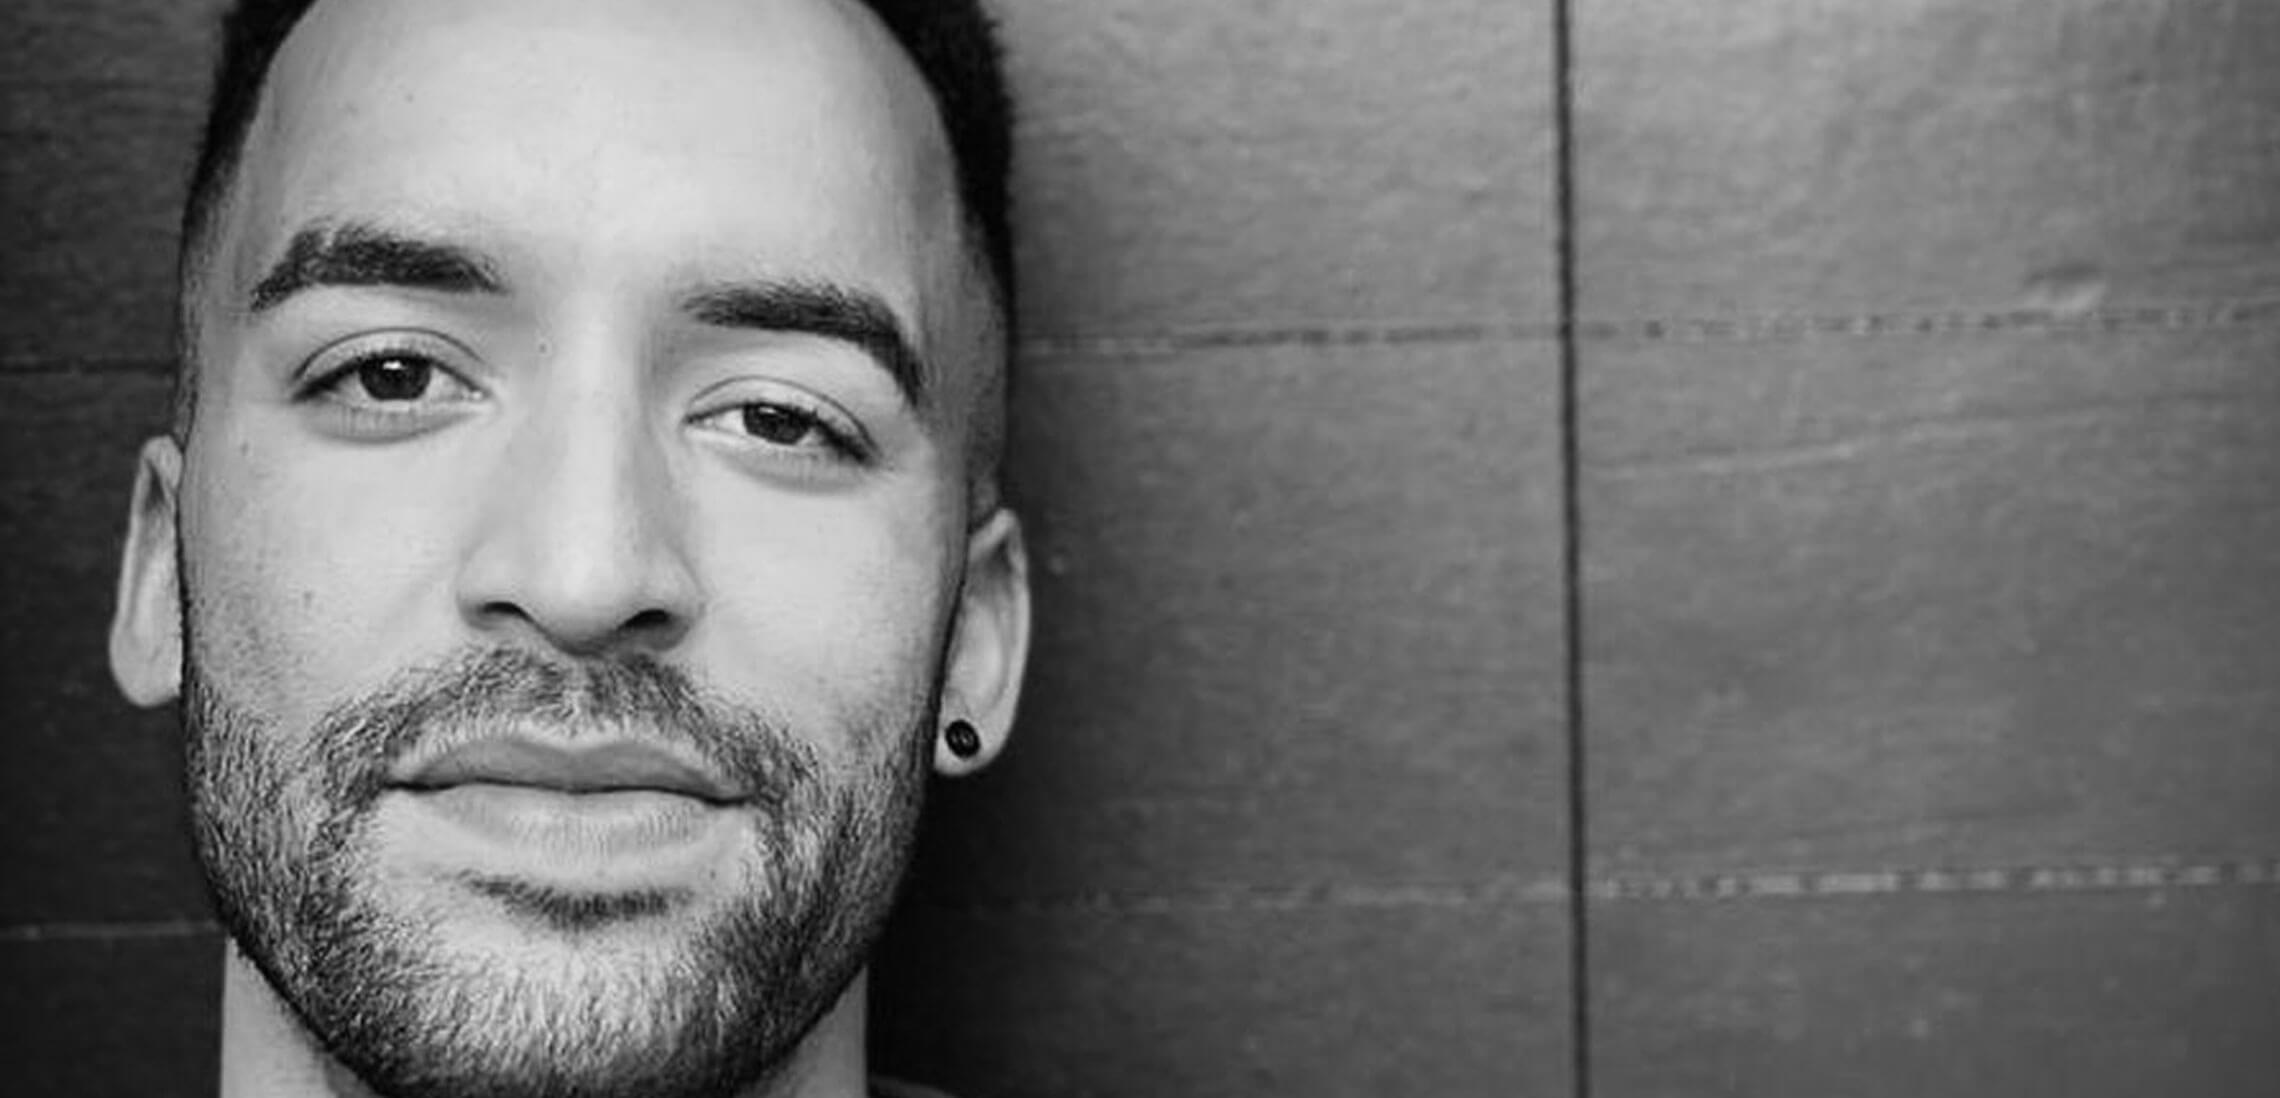 Agustin Alvarez, Andy Catana - Morale EP (Incl Harry Wills & Politics Of Dancing Remixes) hero